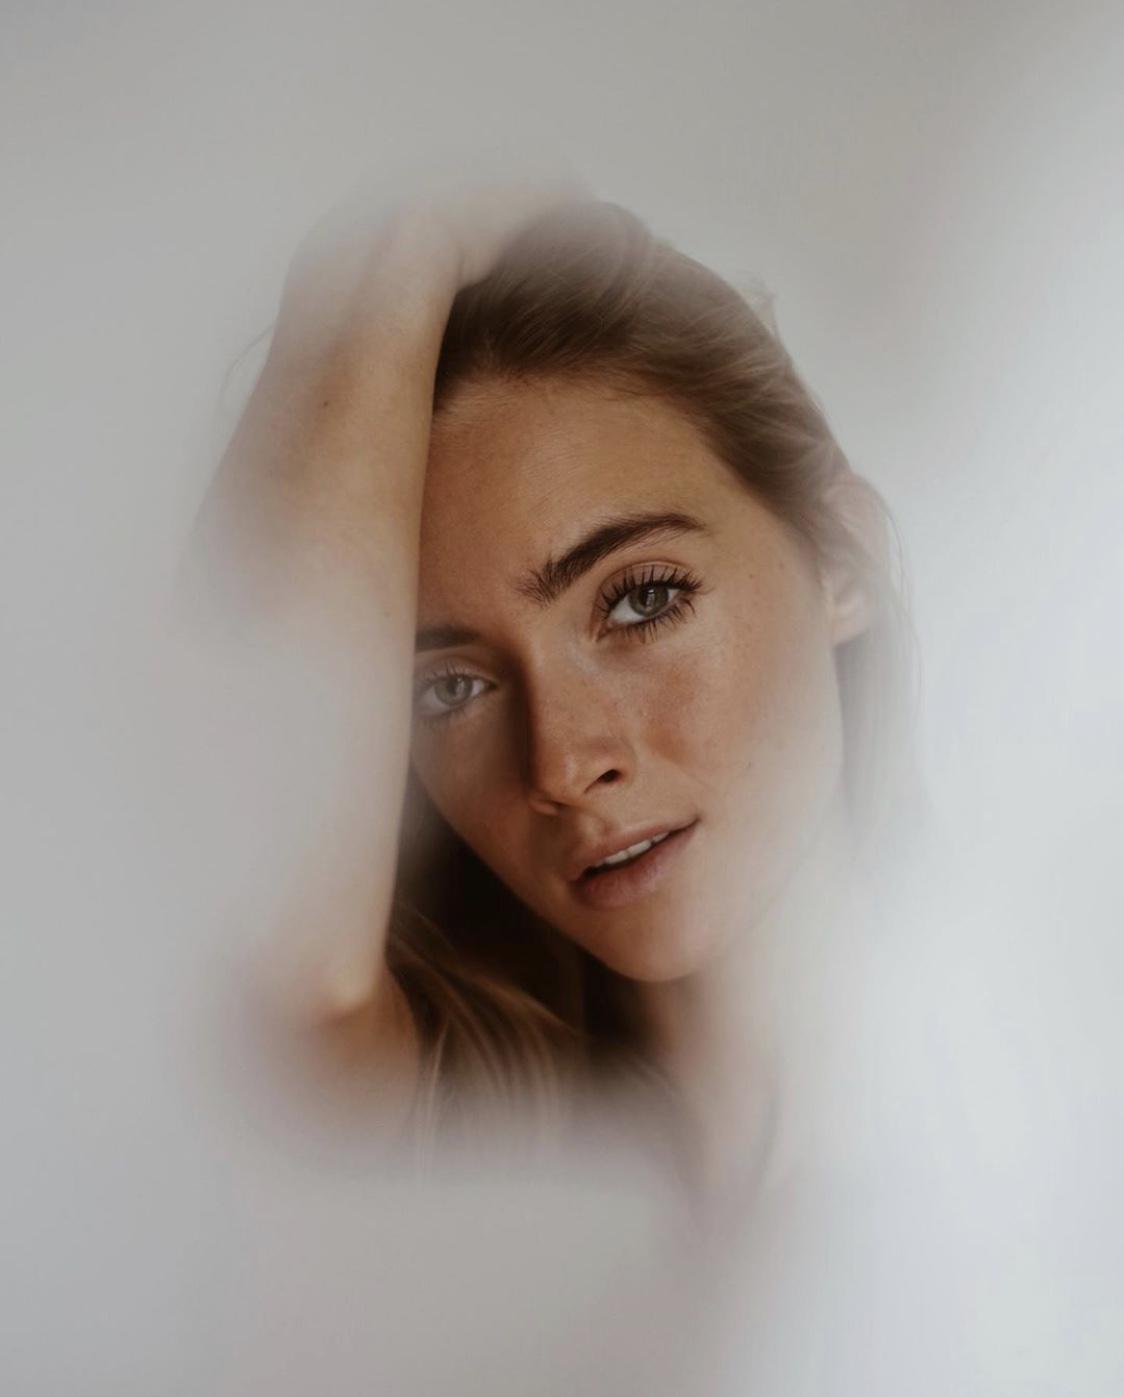 By-Simone-Stocker_Blossome-Podcast-Self Love_Jiliciousjourney_Jil Zeletzki